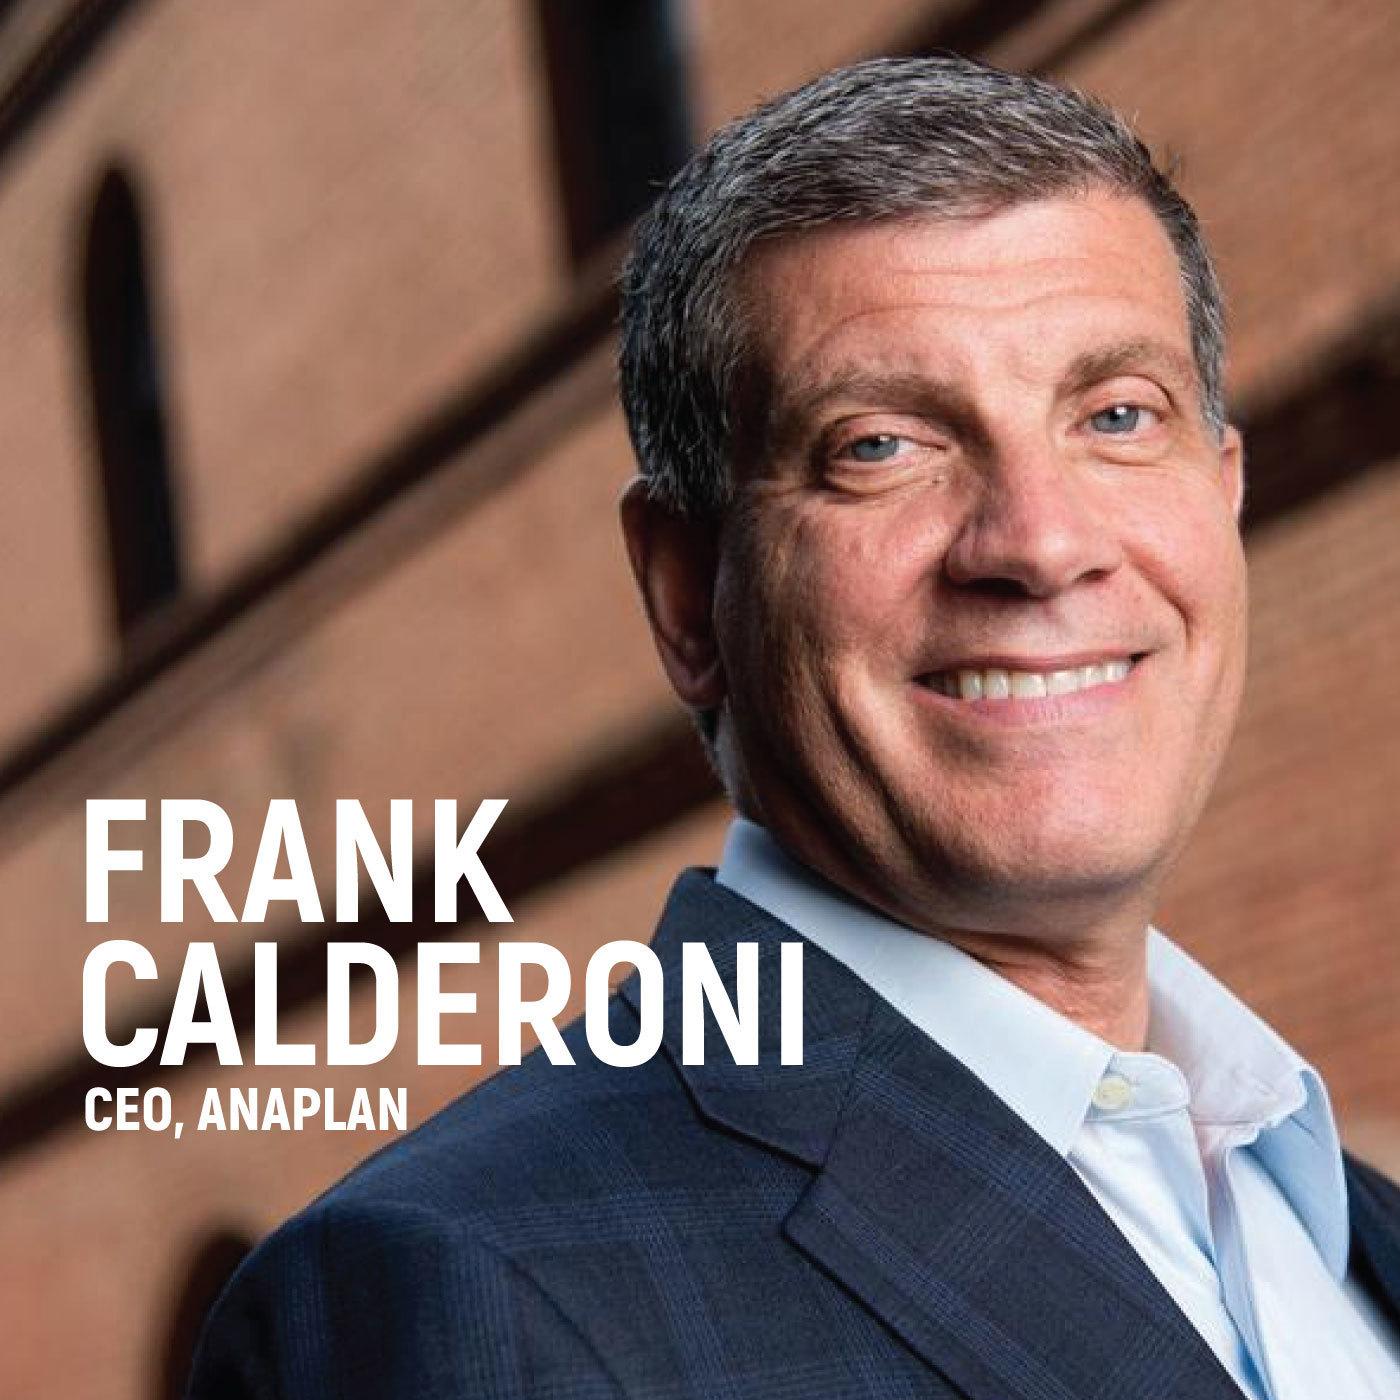 Frank Calderoni